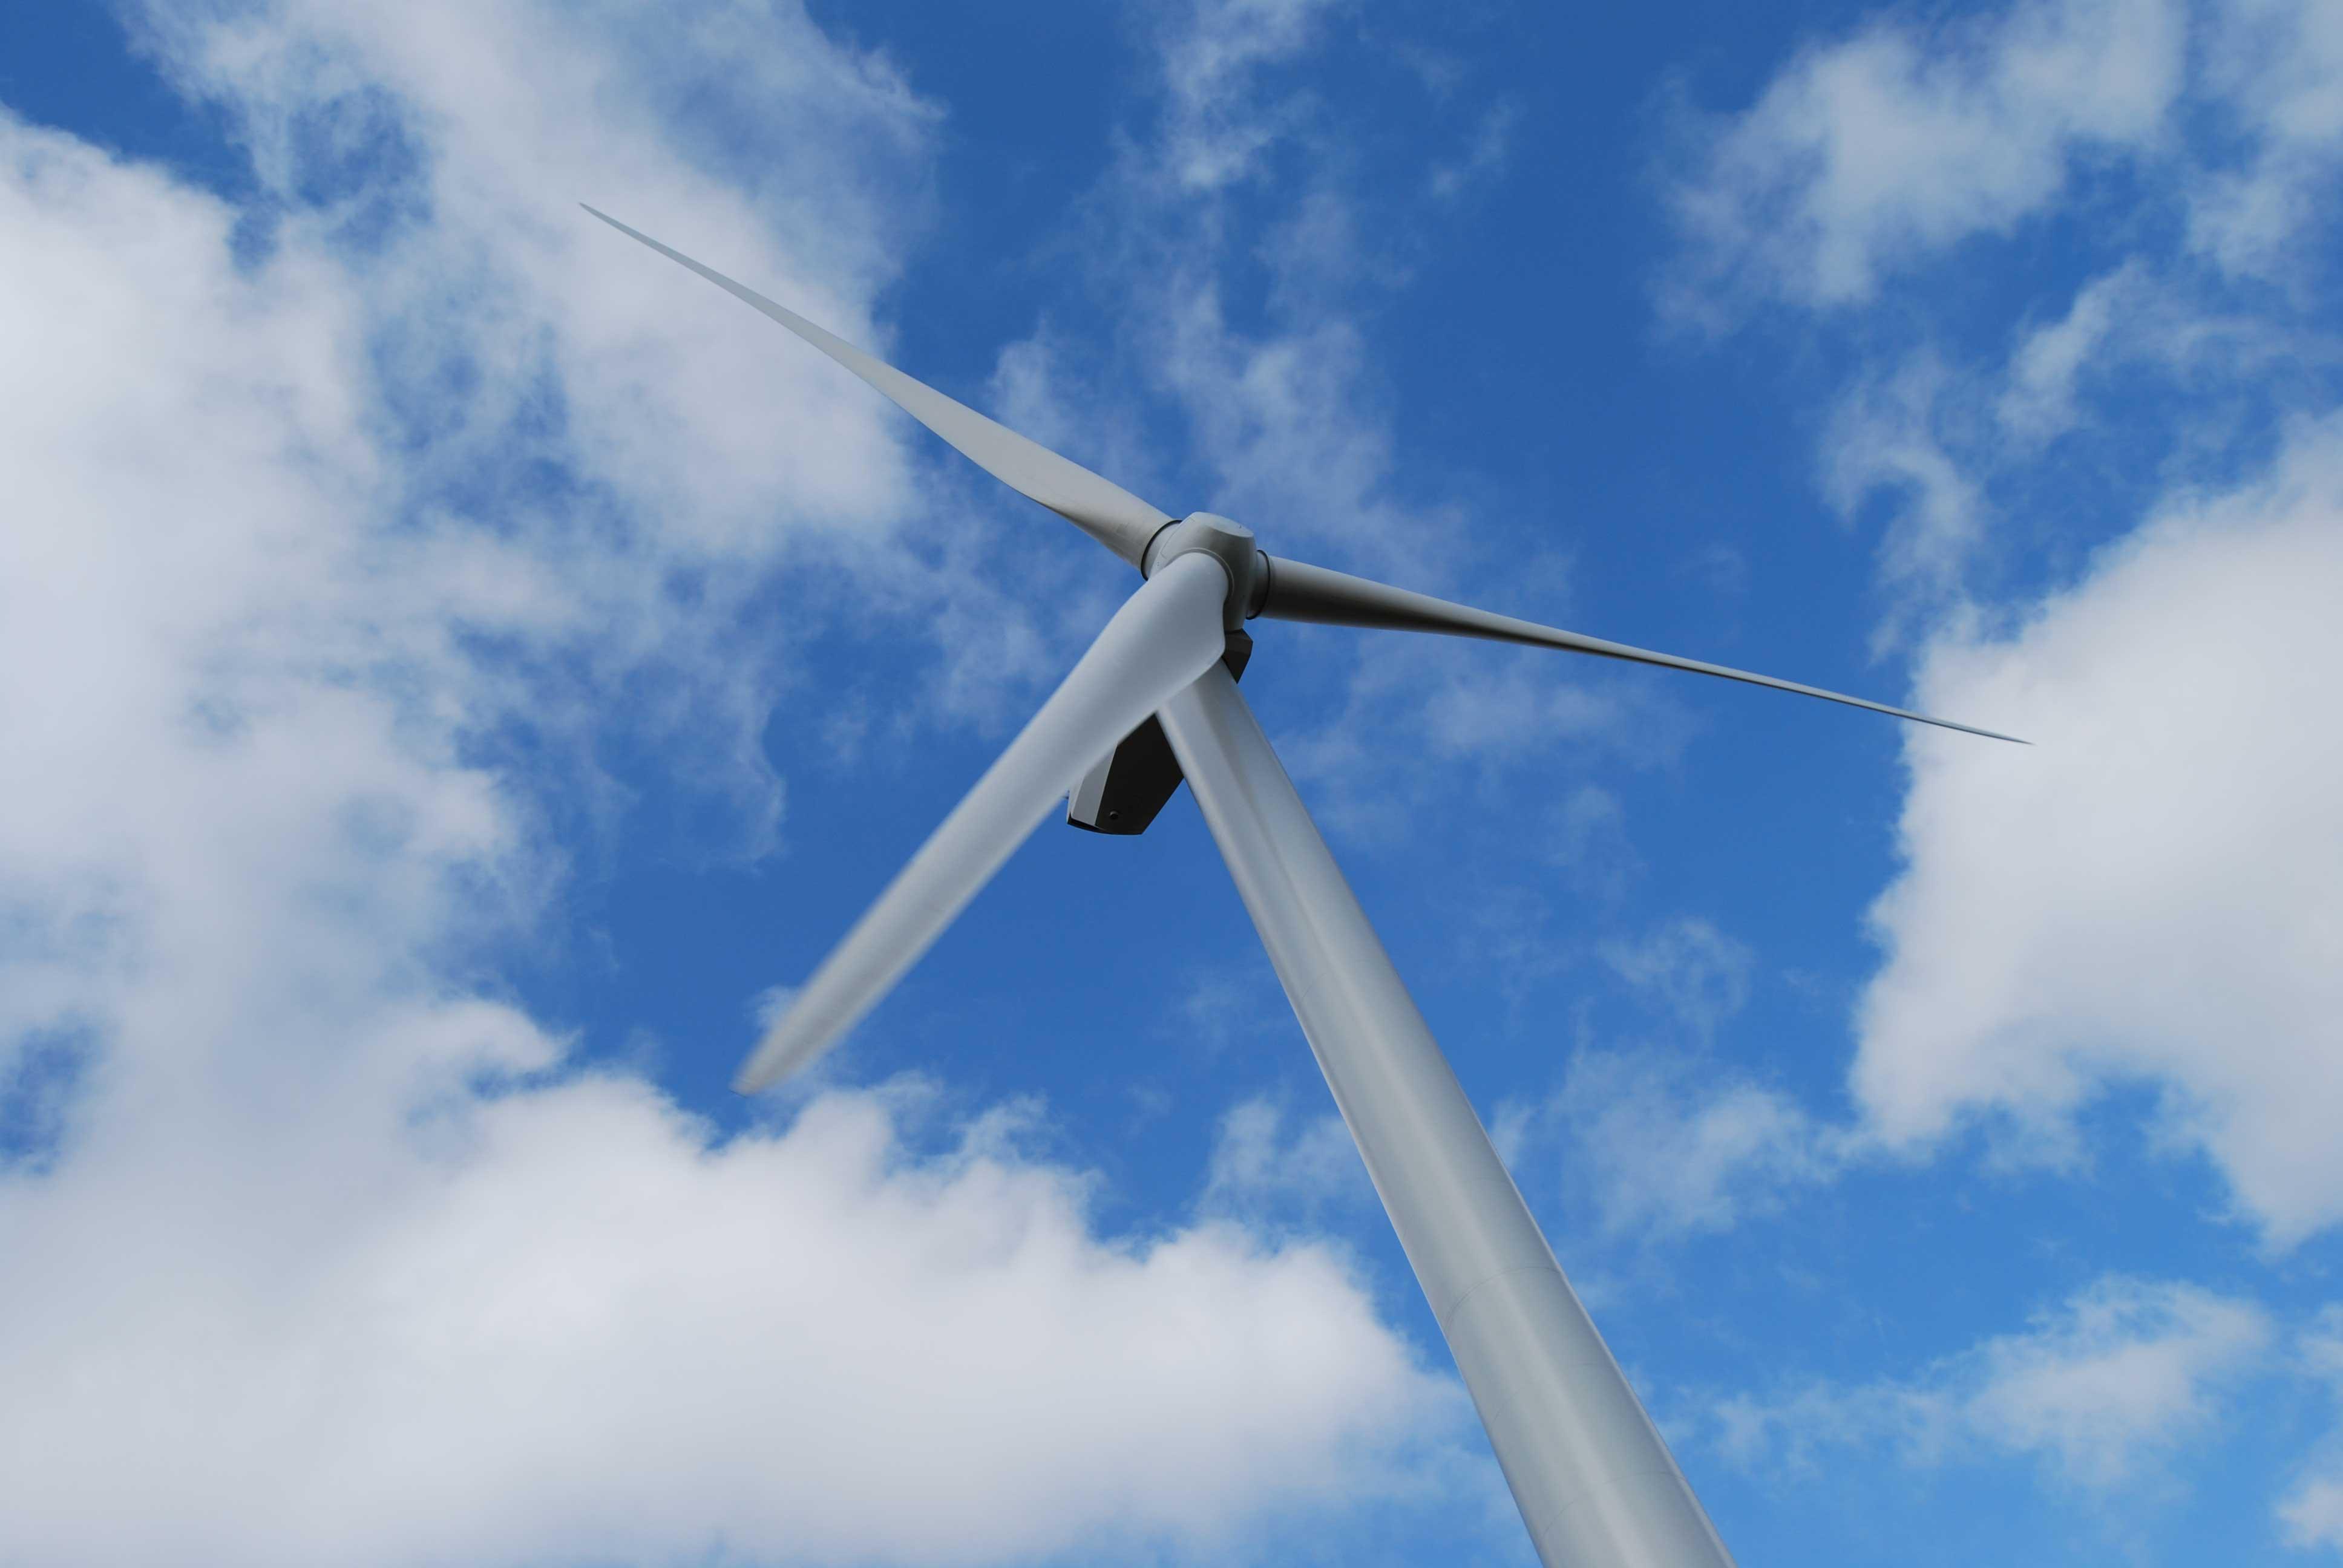 Turbine pic